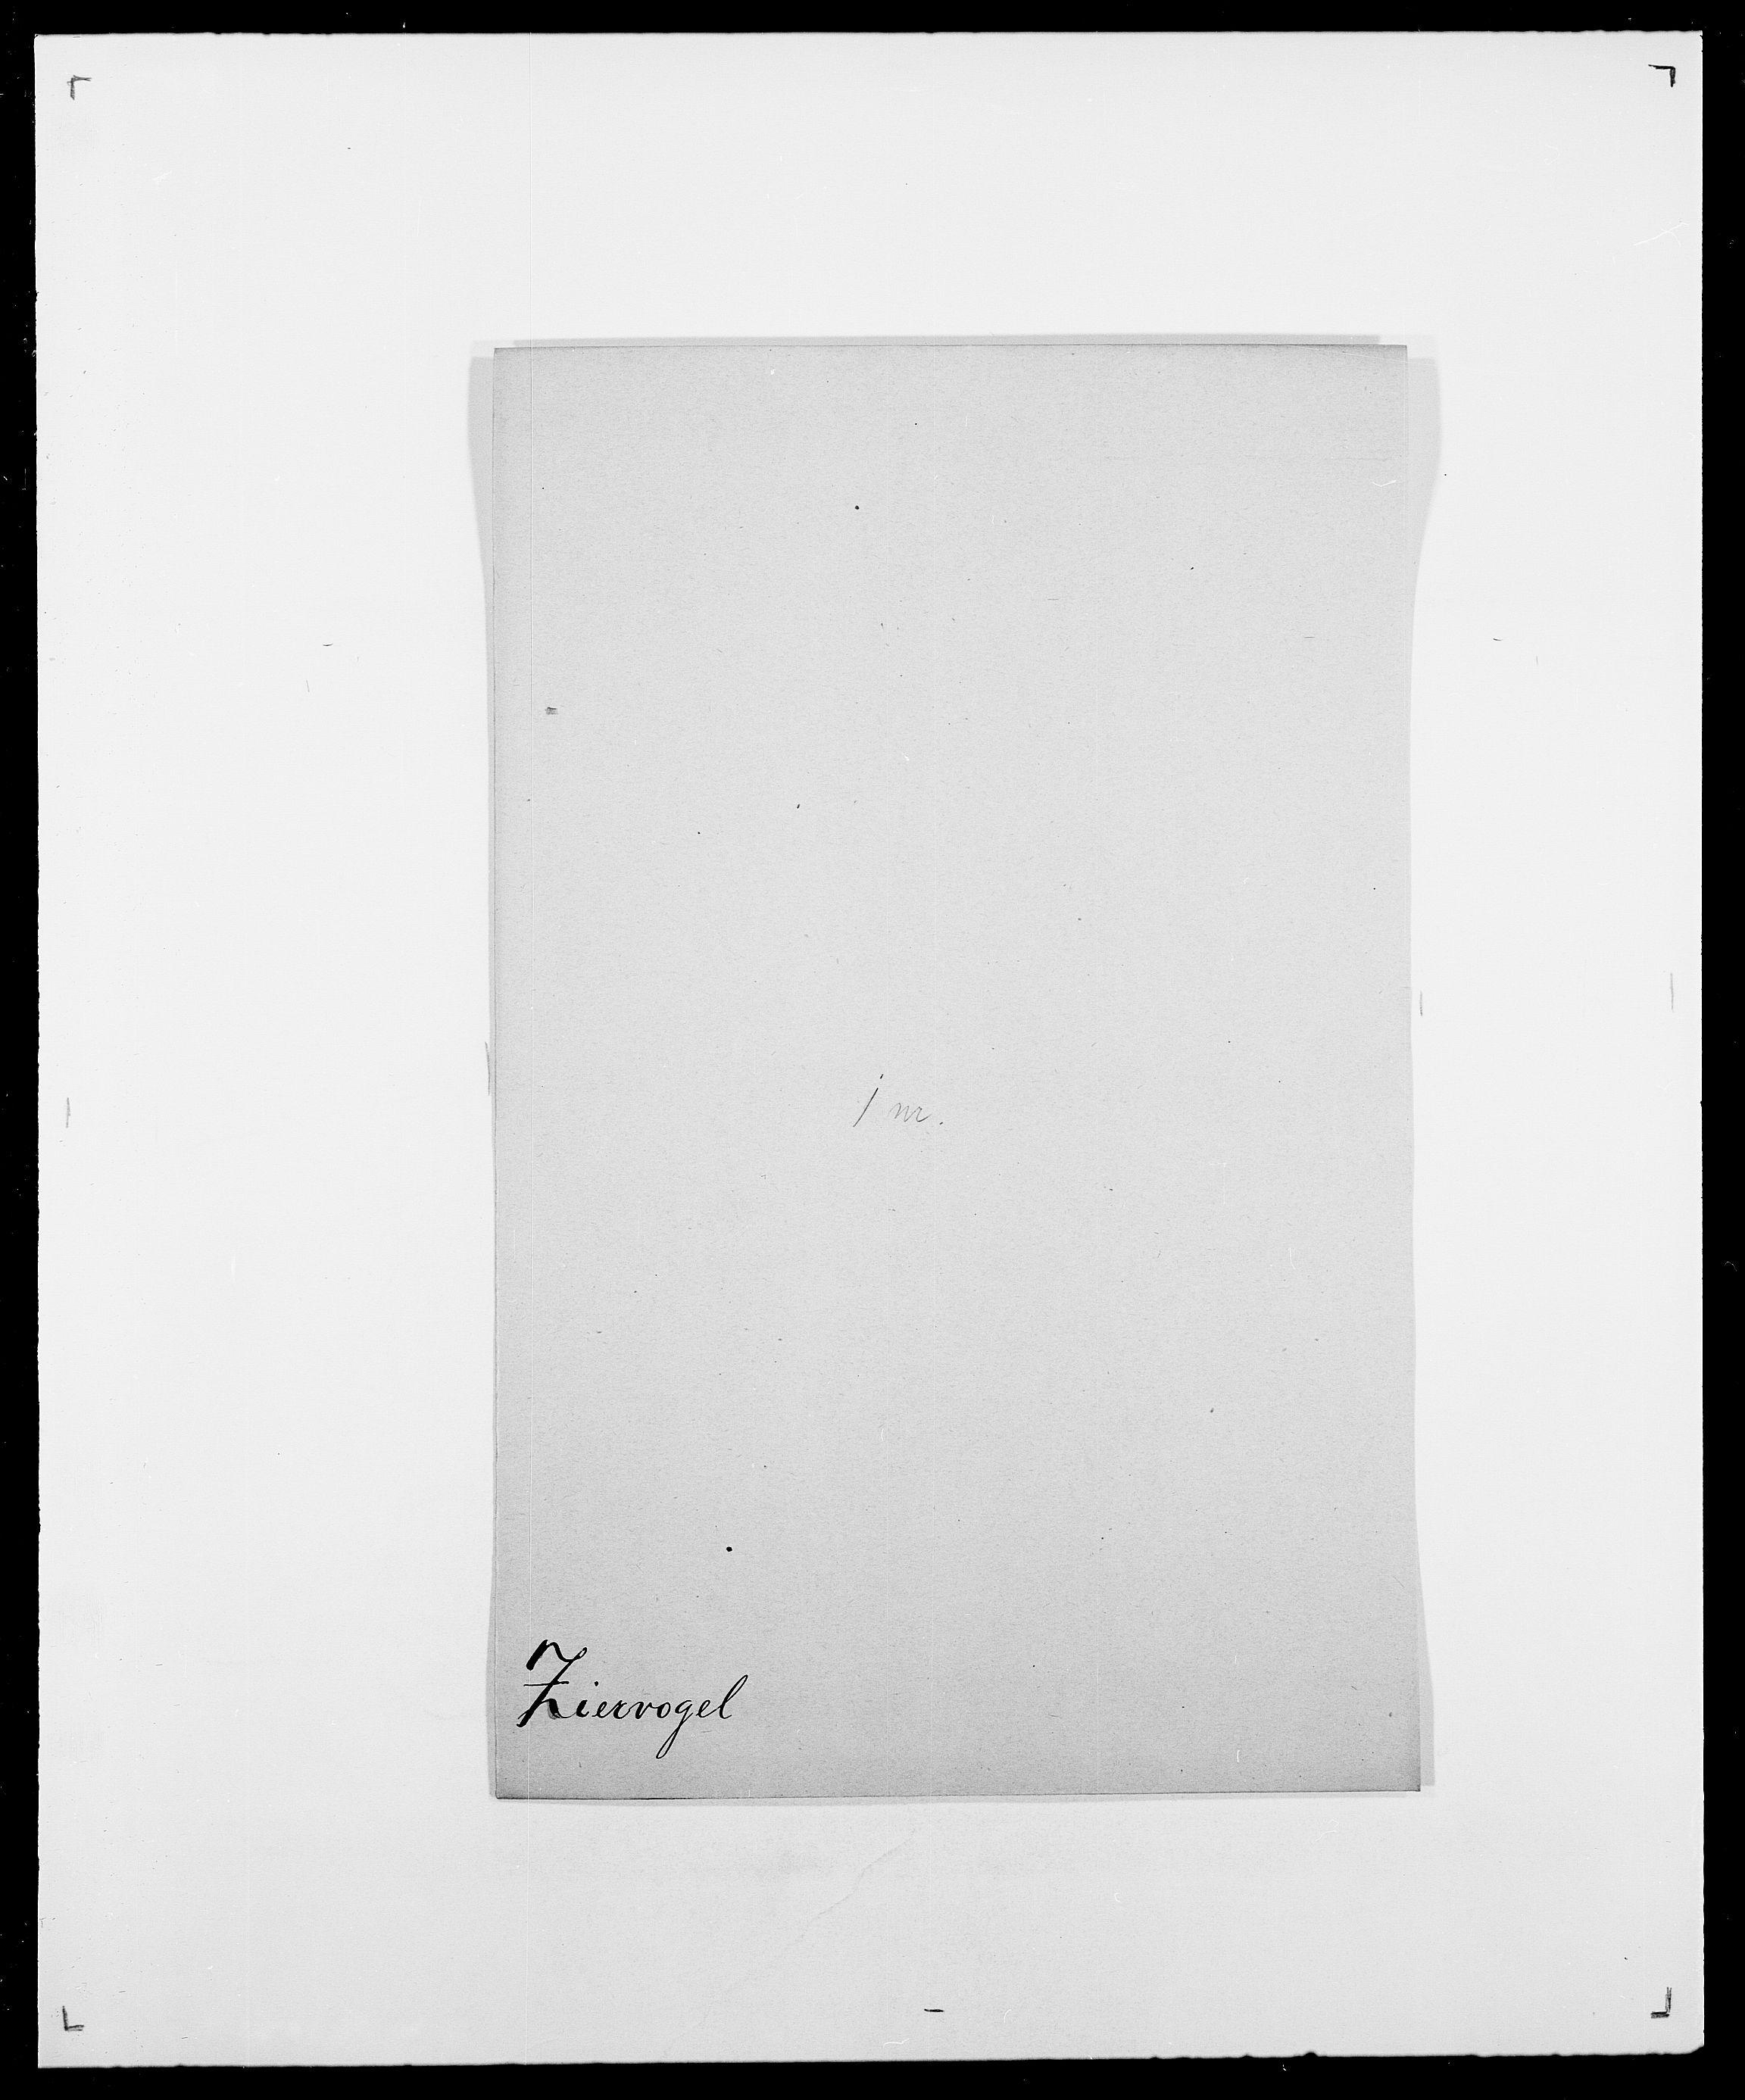 SAO, Delgobe, Charles Antoine - samling, D/Da/L0043: Wulfsberg - v. Zanten, s. 156